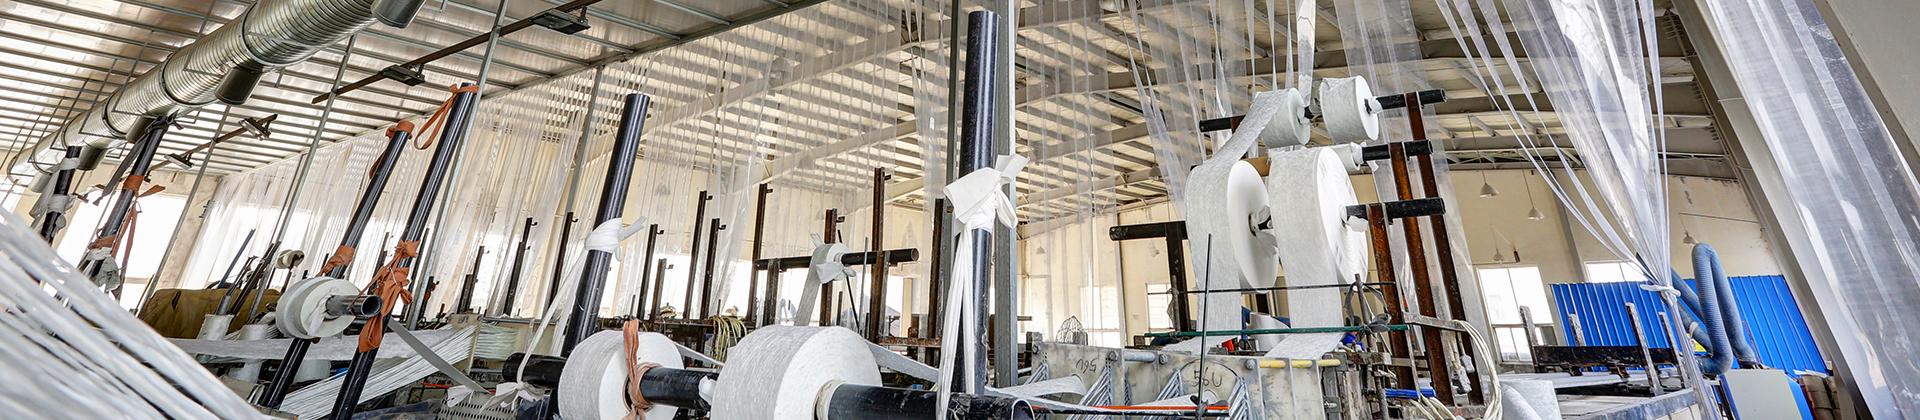 fiberglass, fiberglass stake,pultrusion, fiberglass decking, fiberglass grating,  fiberglass rebar, carbon fiber tube, carbon fiber roller